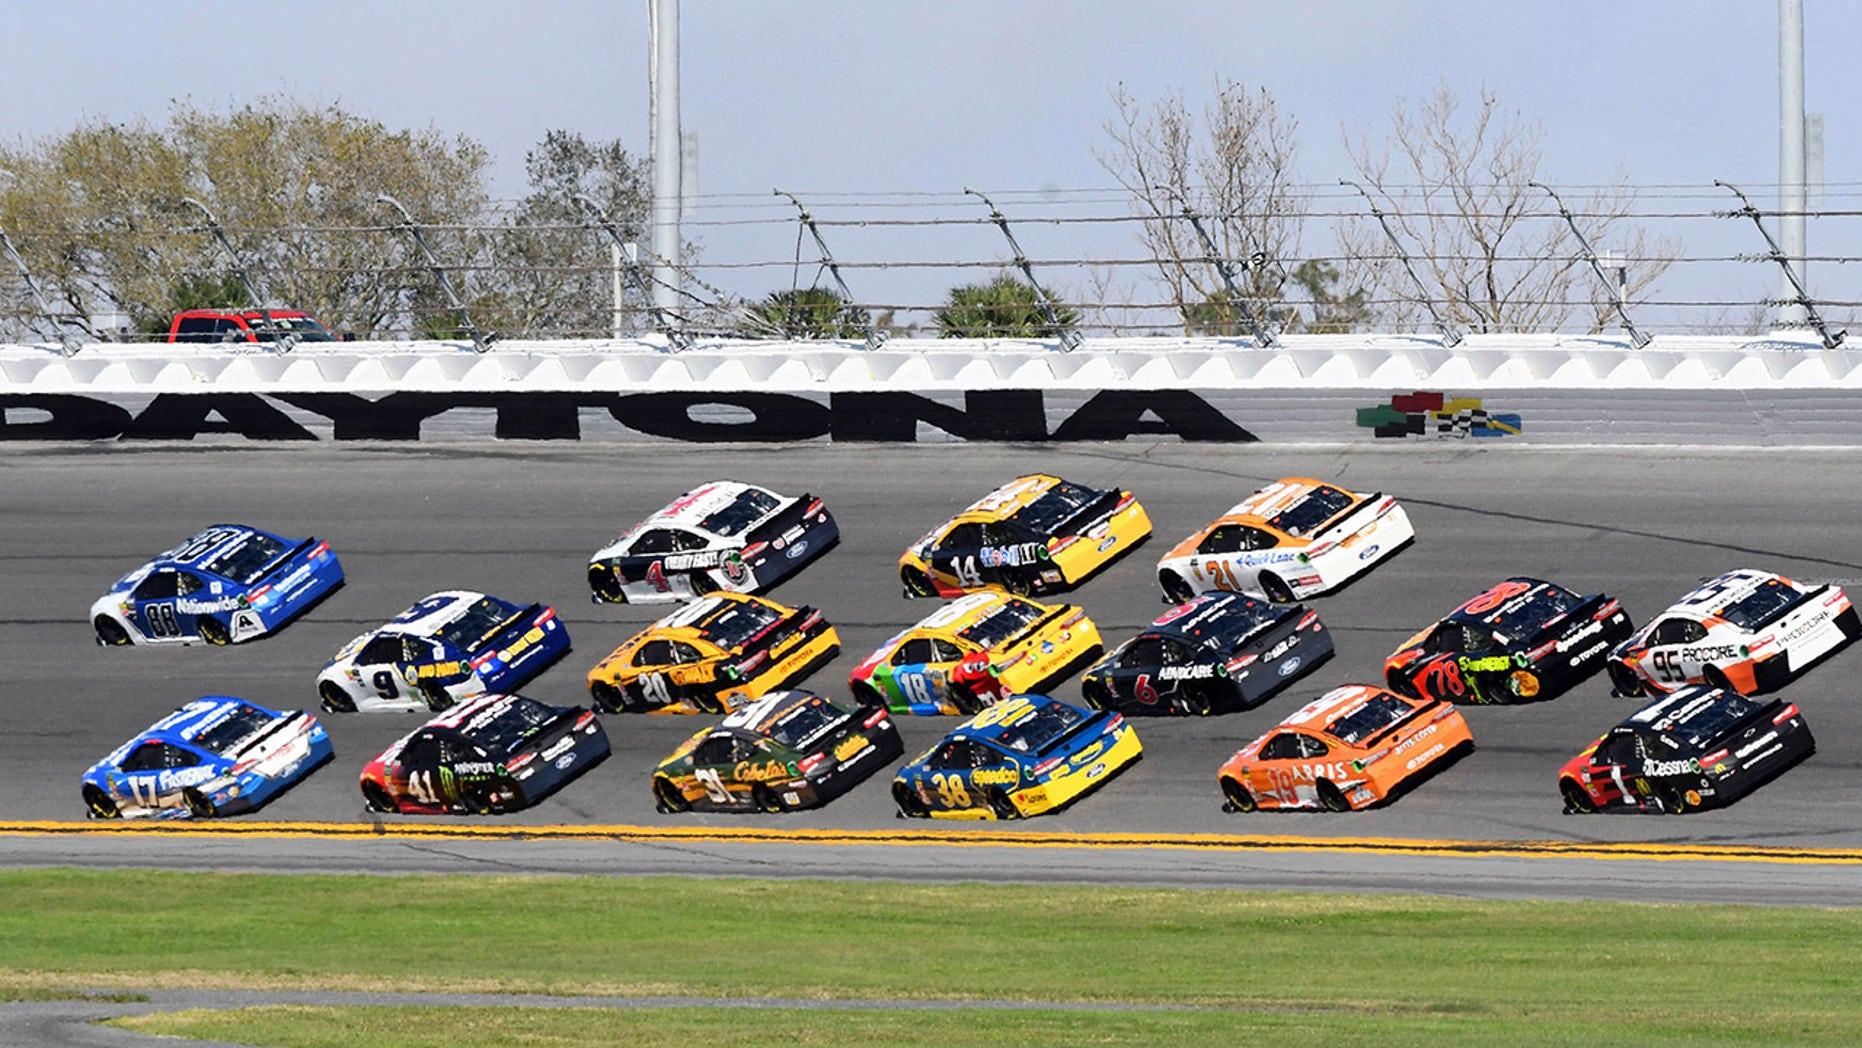 Feb 18, 2018; Daytona Beach, FL, USA; NASCAR Cup Series driver Alex Bowman (88) and Ricky Stenhouse Jr. (17)  lead the field during the Daytona 500 at Daytona International Speedway. Mandatory Credit: Mike DiNovo-USA TODAY Sports - 10627874